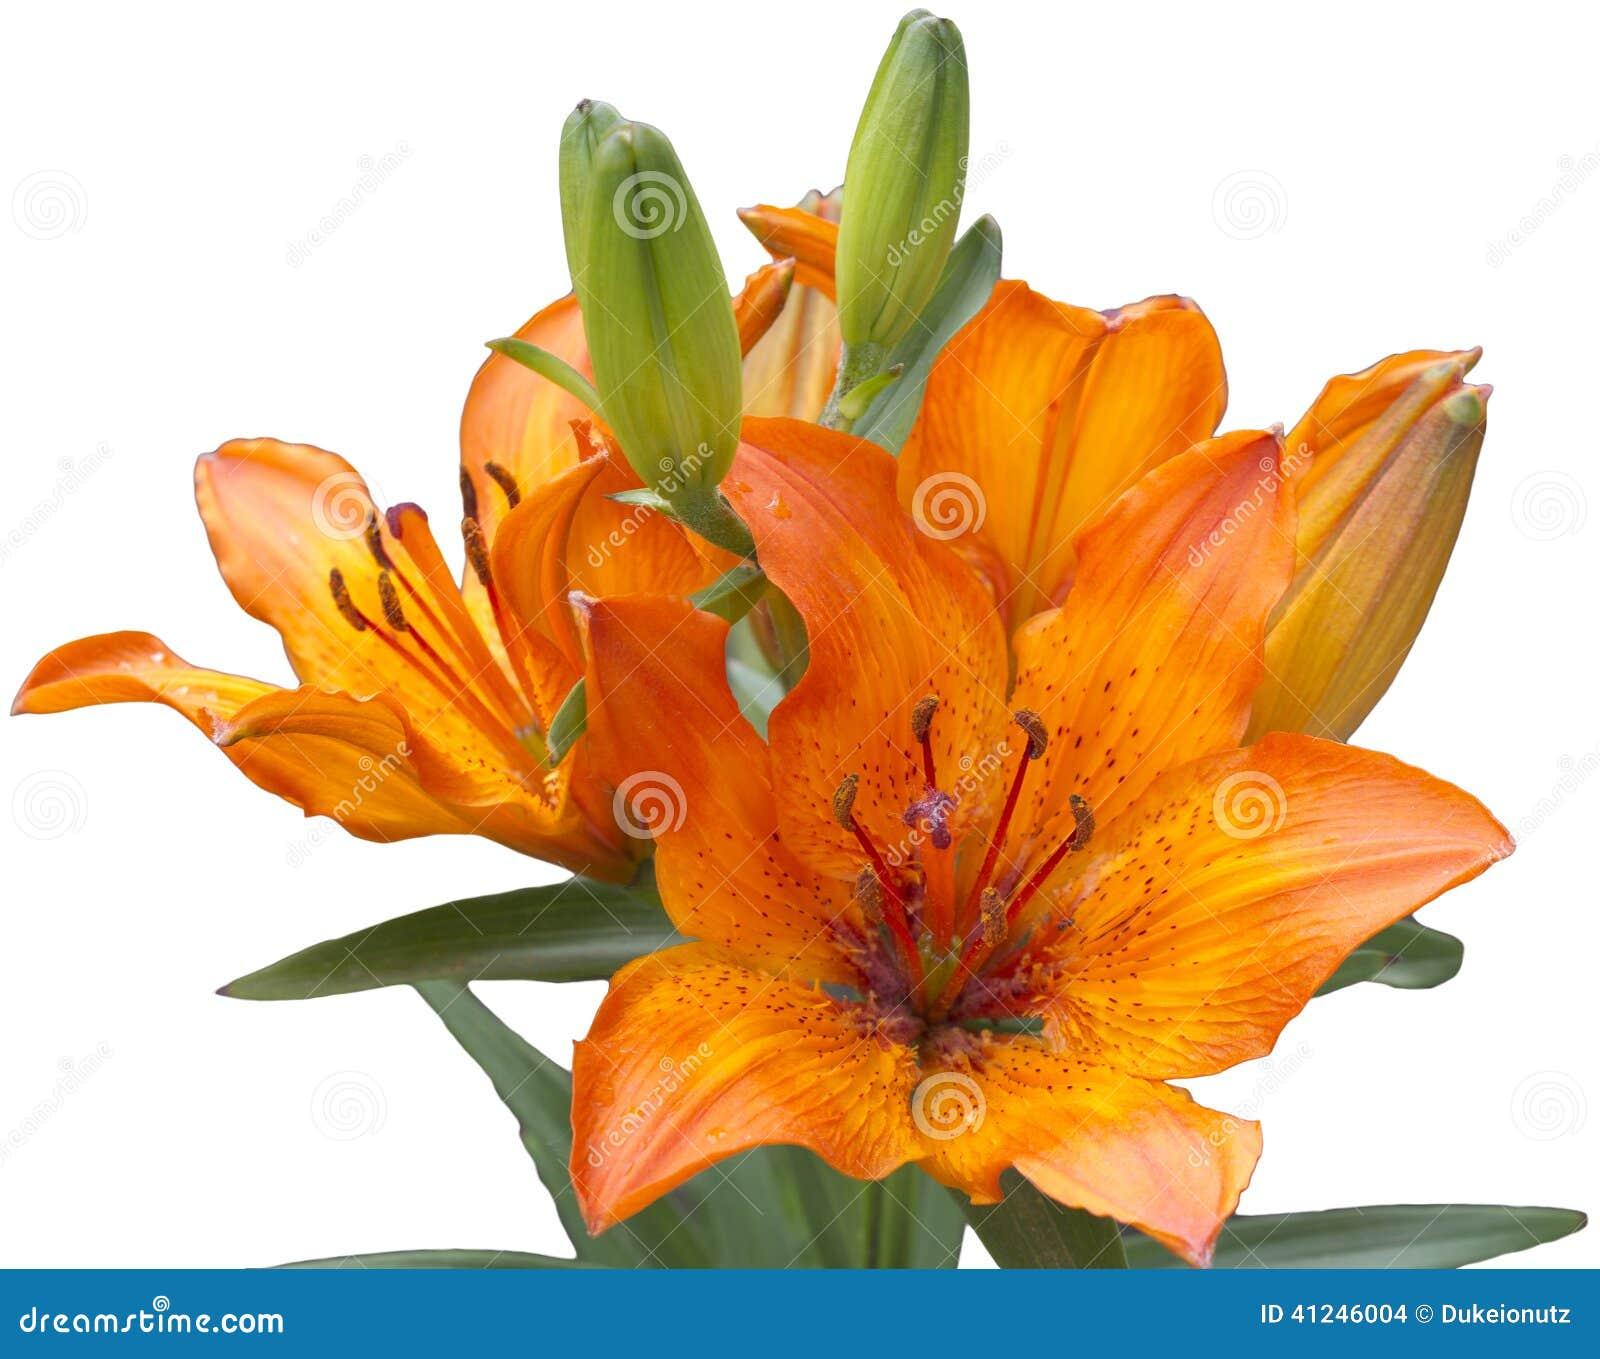 Orange lilly on white background stock photo image of macro buds royalty free stock photo izmirmasajfo Image collections